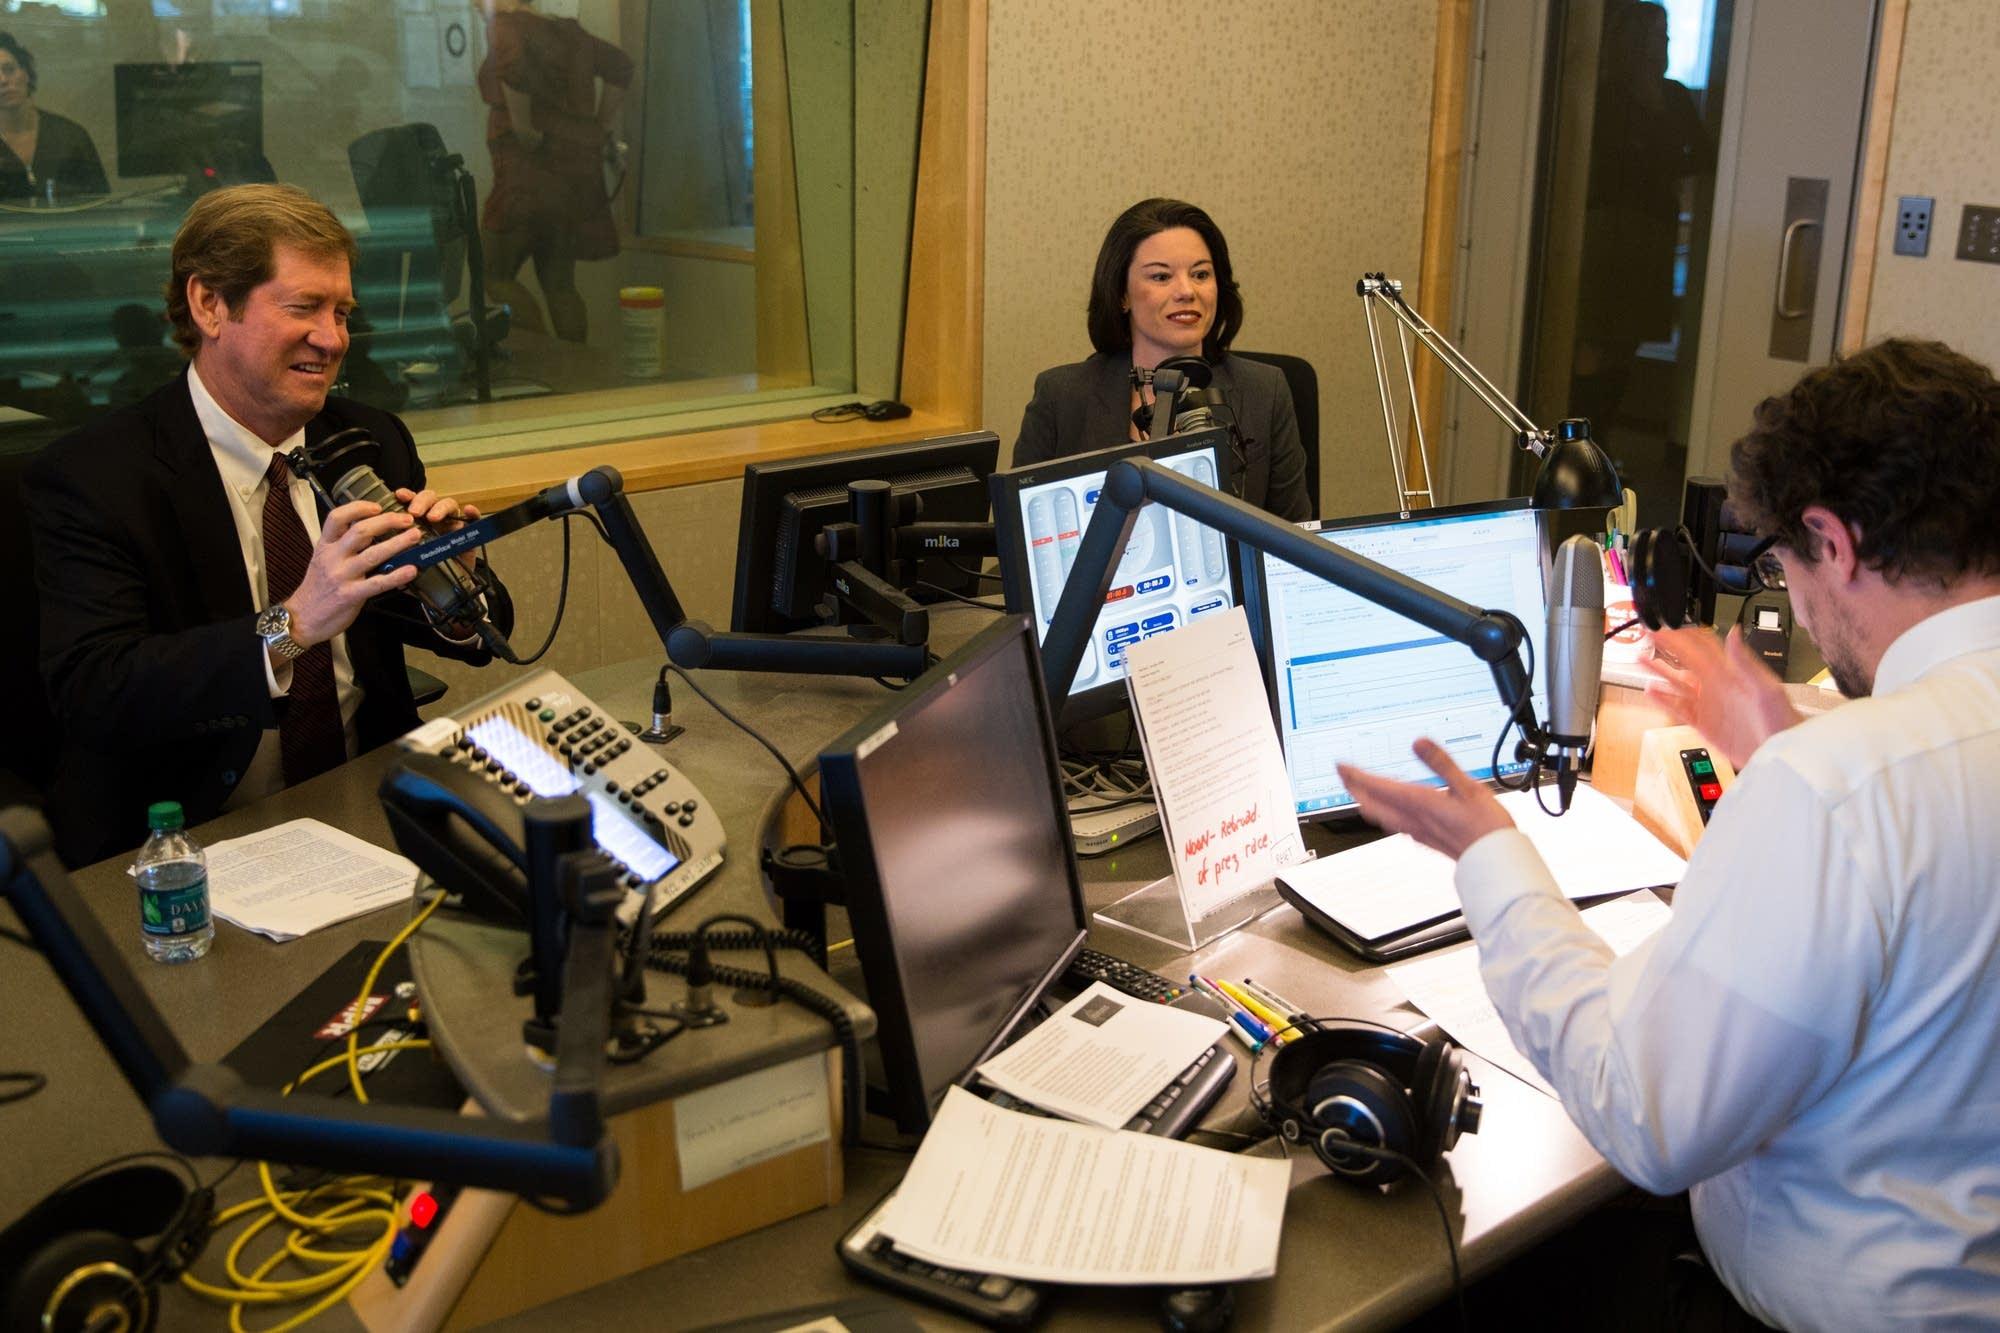 Angie Craig and Jason Lewis debate at MPR